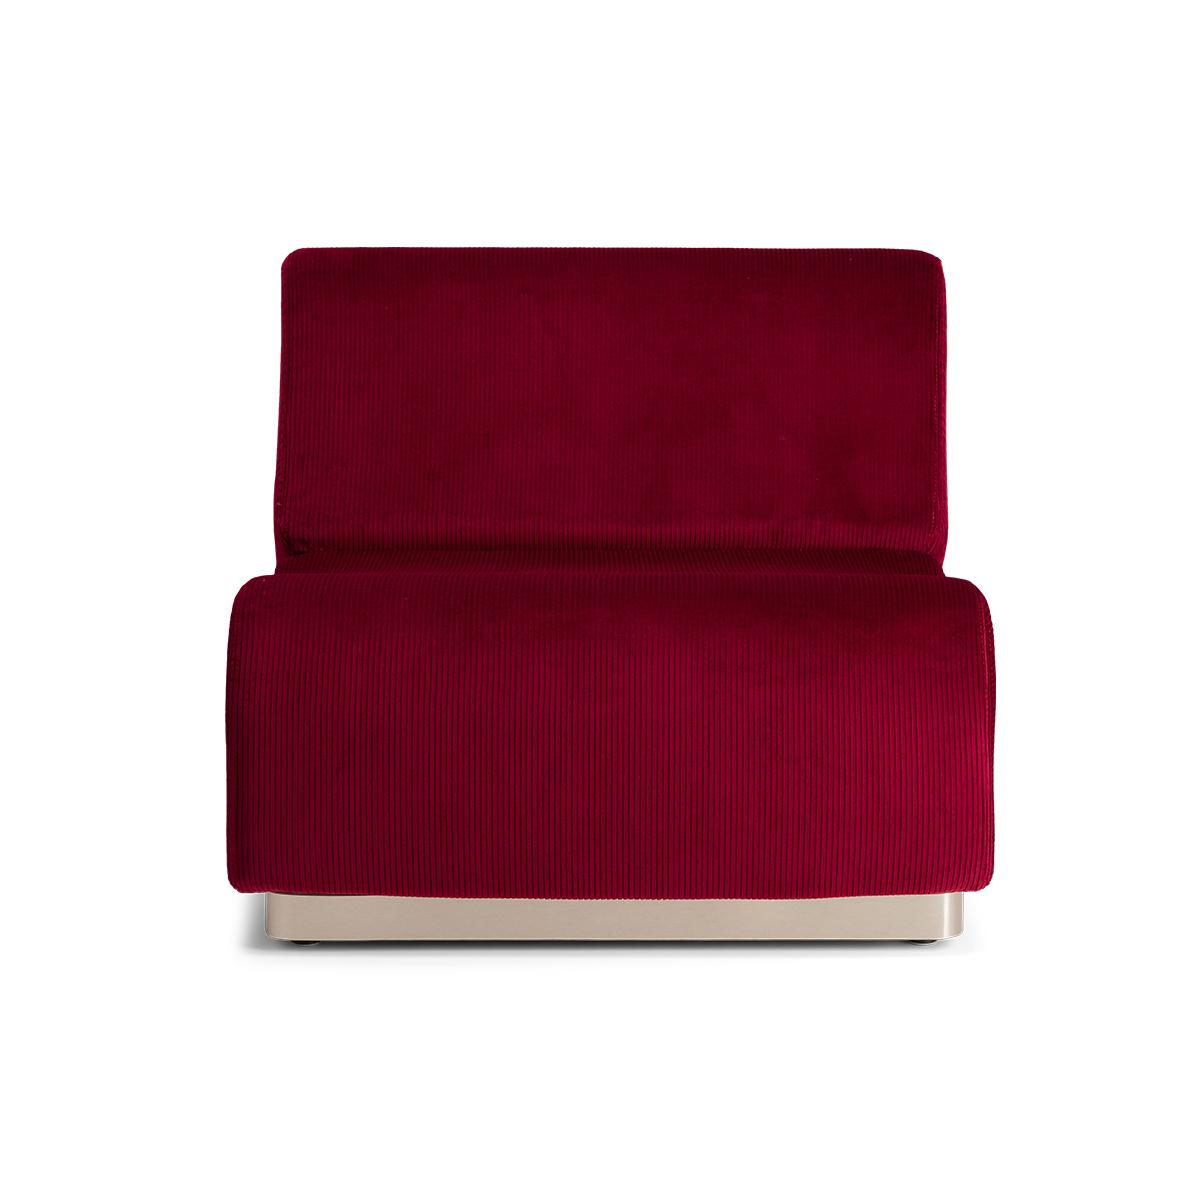 Rotondo Fireside chair in Burgundy Corduroy